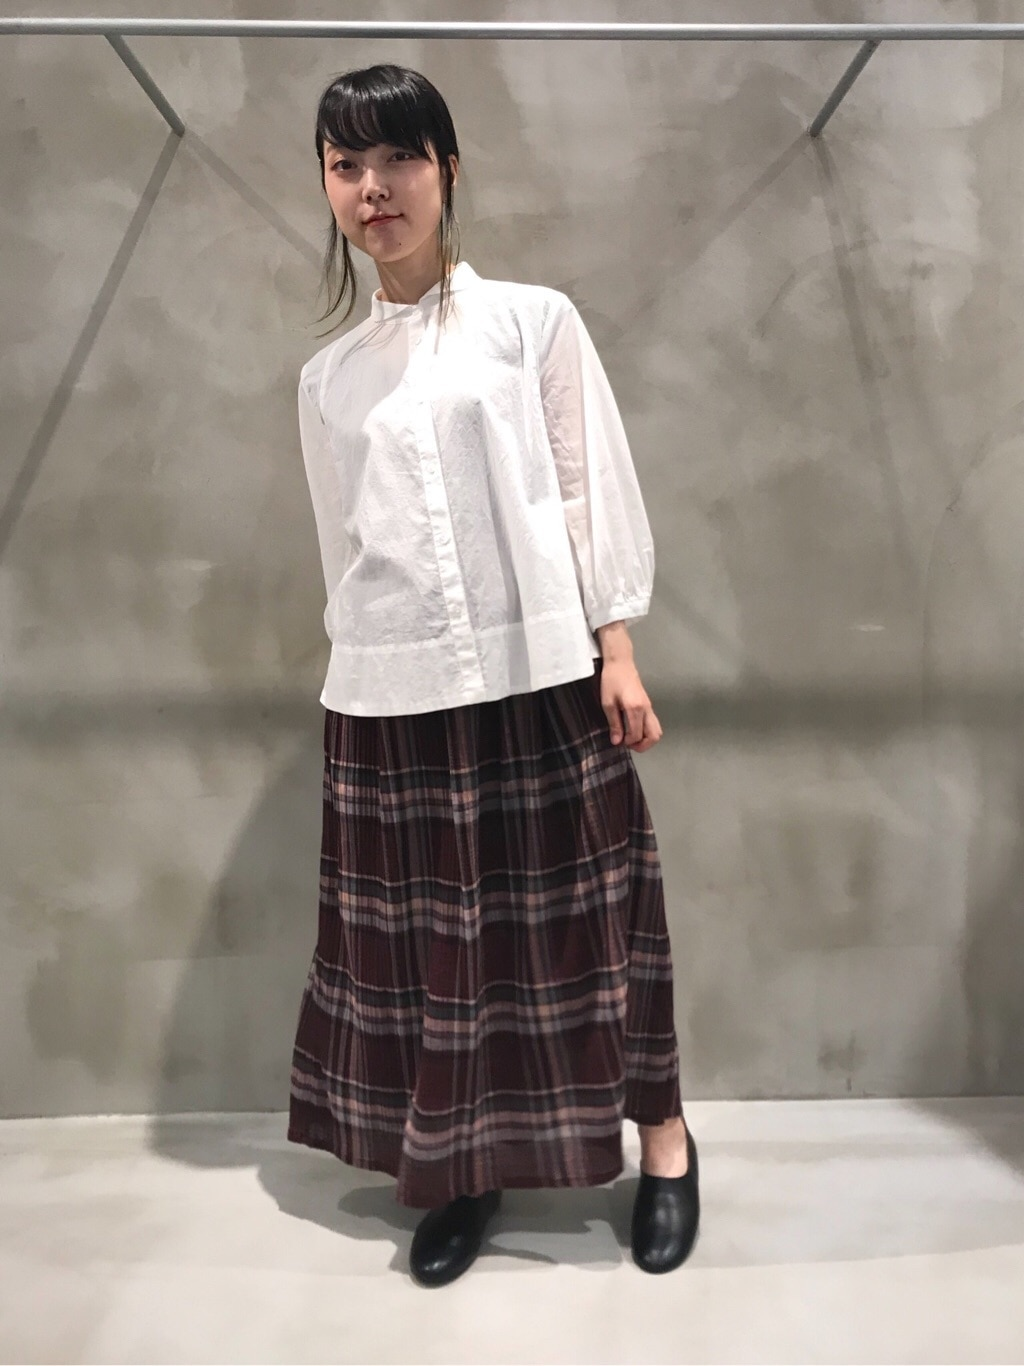 bulle de savon 渋谷スクランブルスクエア 身長:153cm 2020.06.05